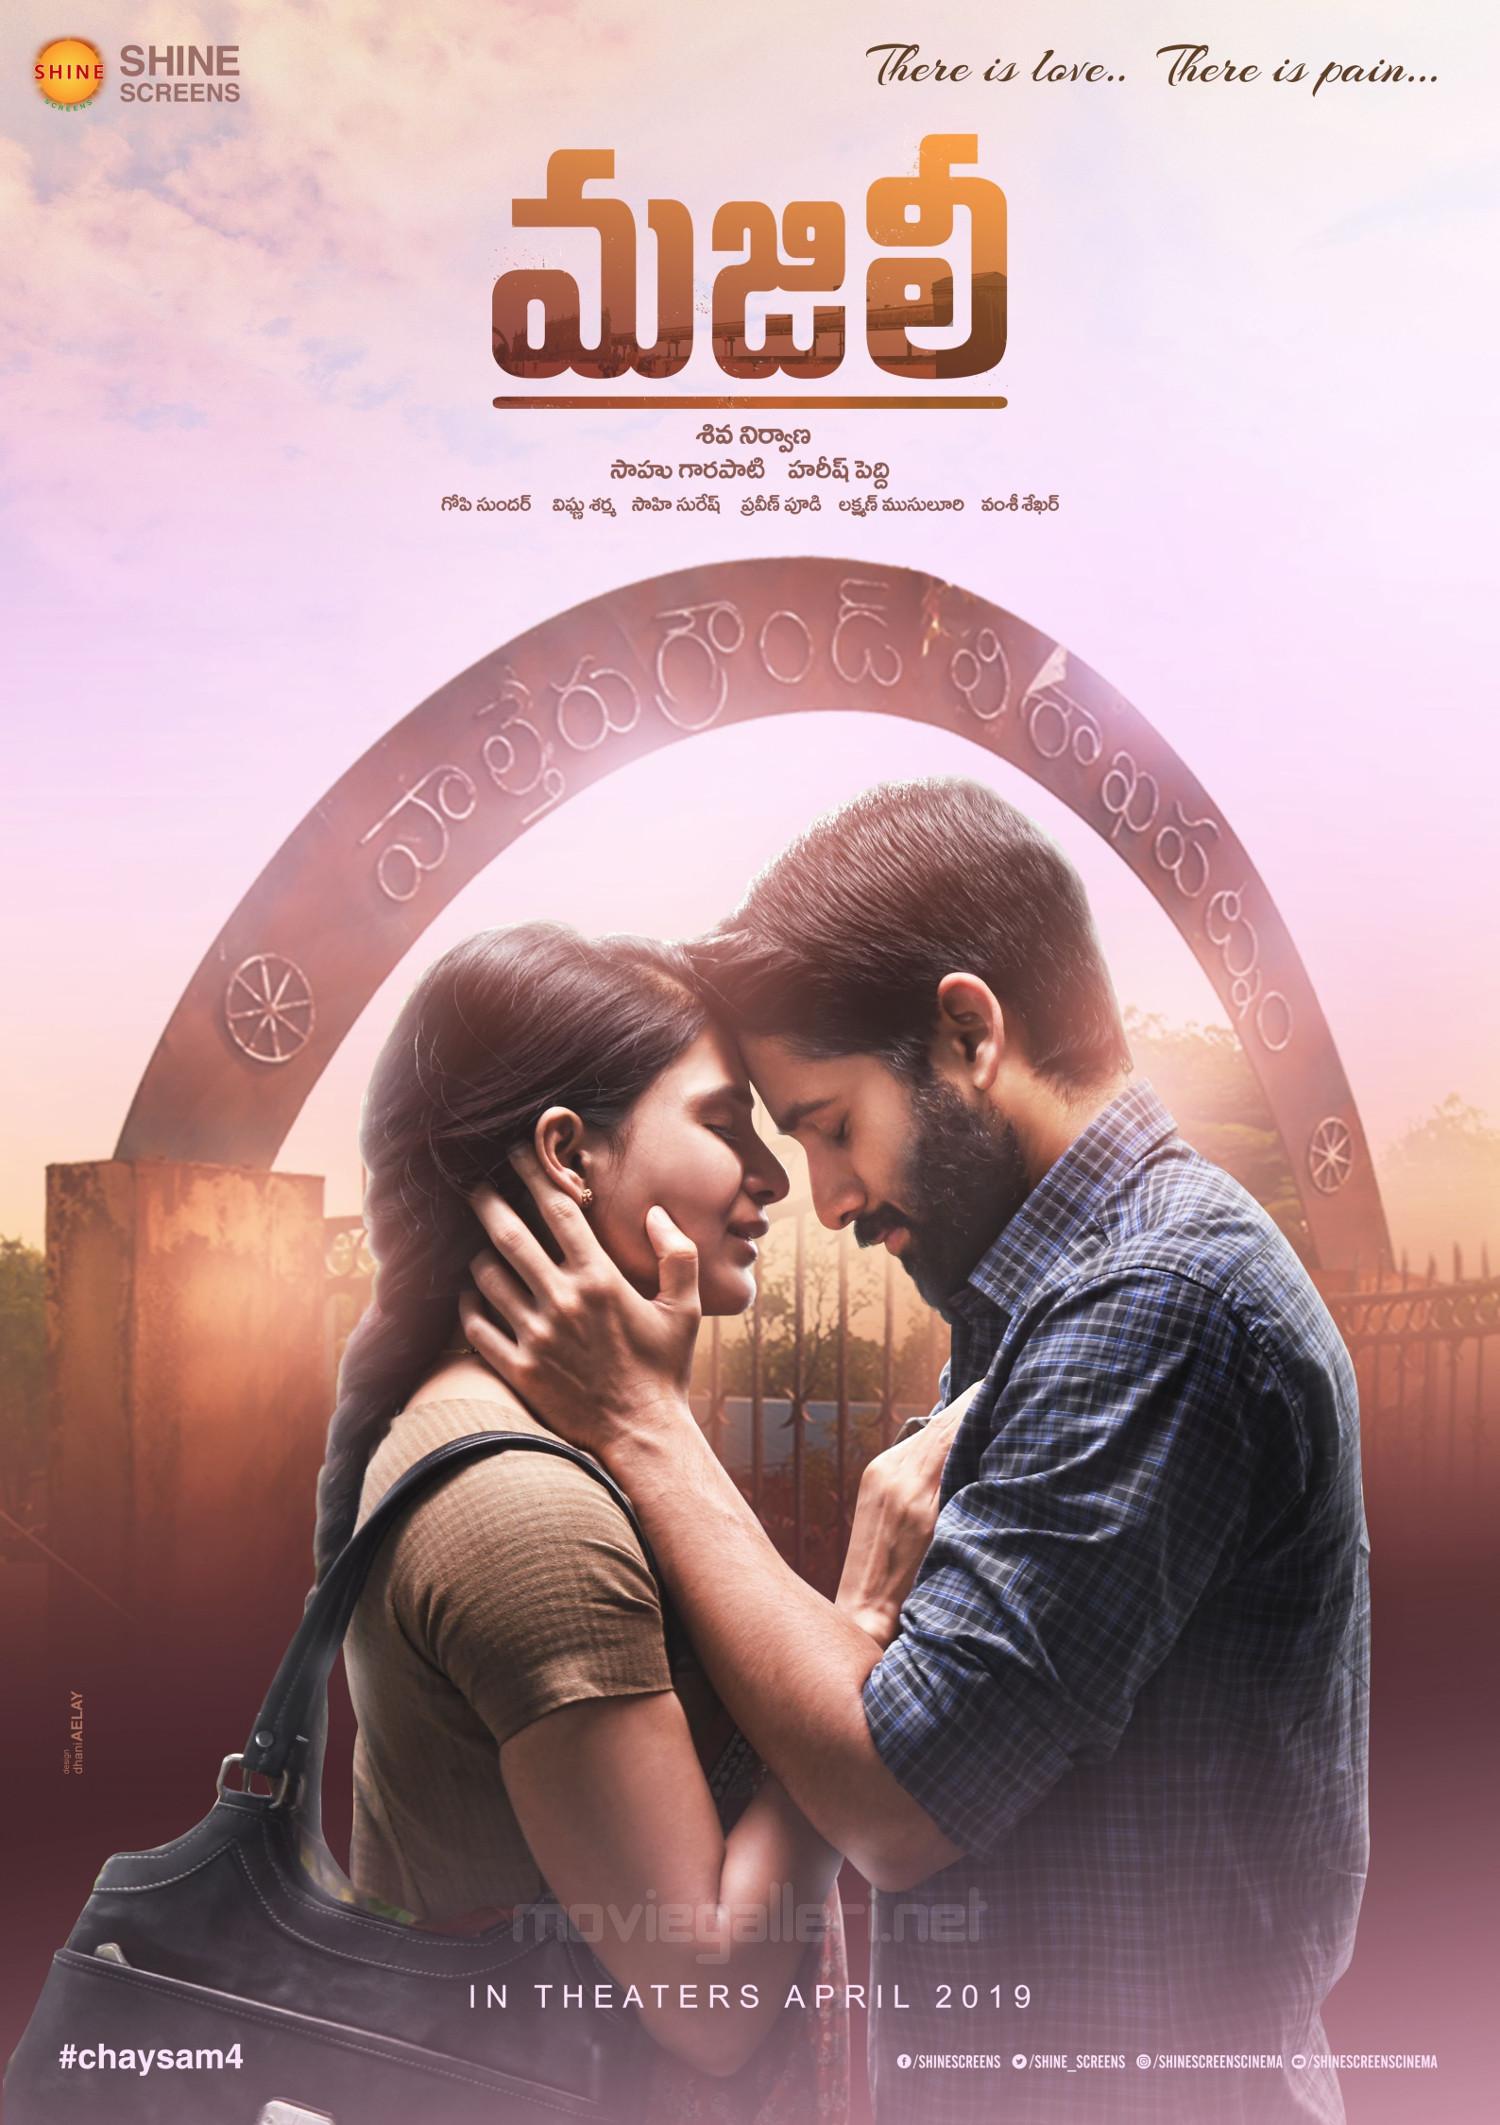 Akkineni Naga Chaitanya Samantha Majili Movie First Look Poster HD